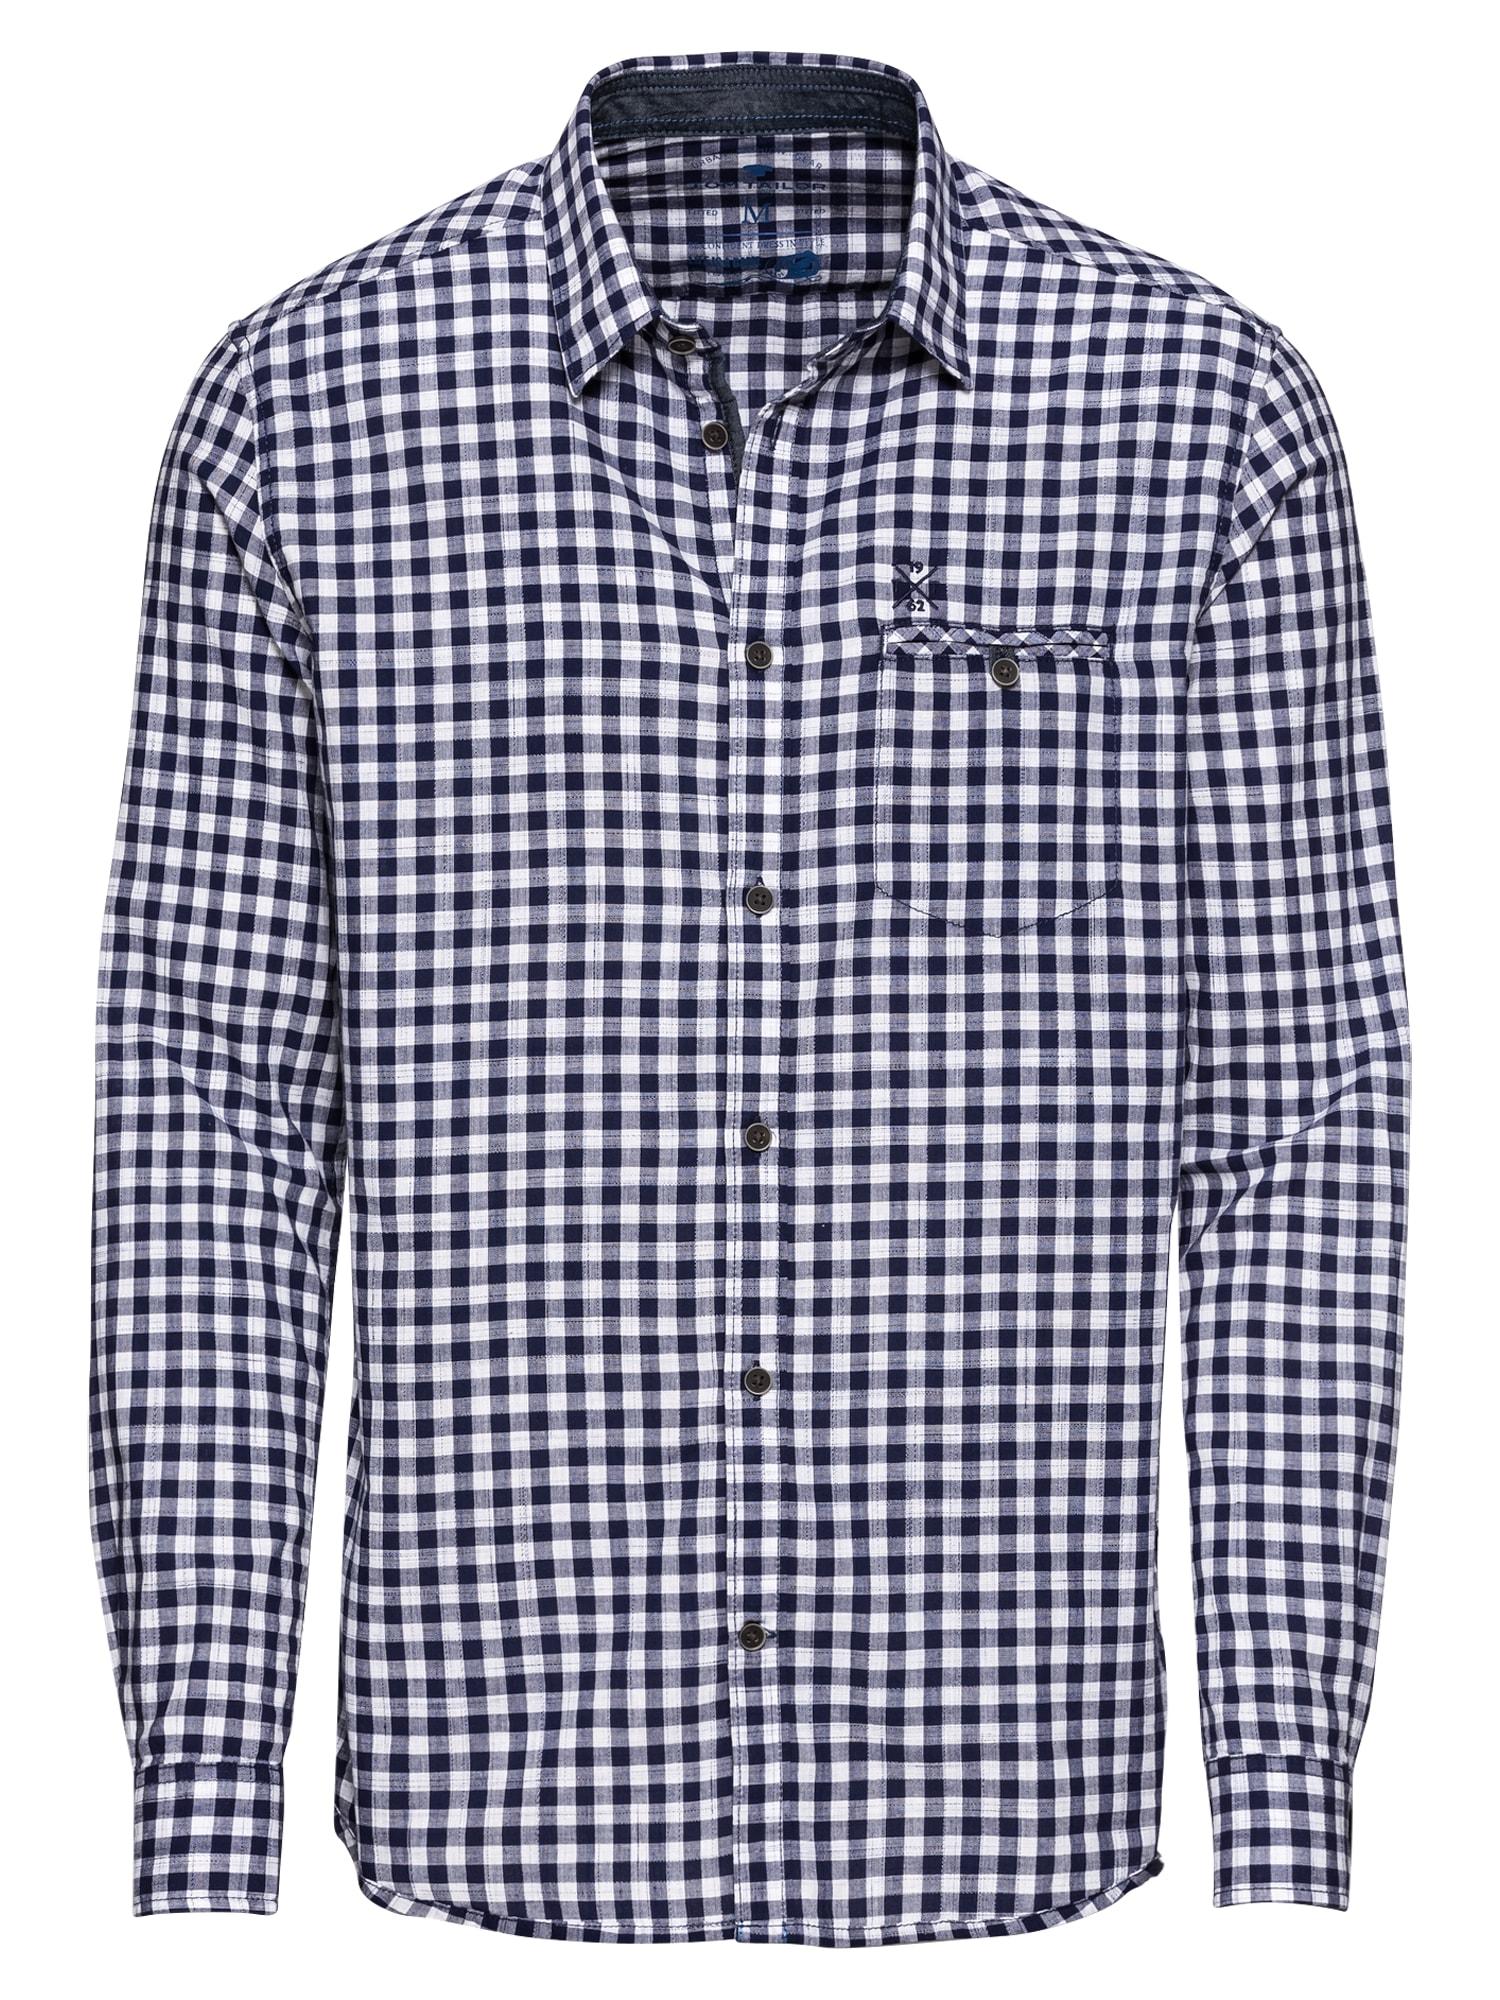 Košile floyd inject vichy shirt modrá TOM TAILOR